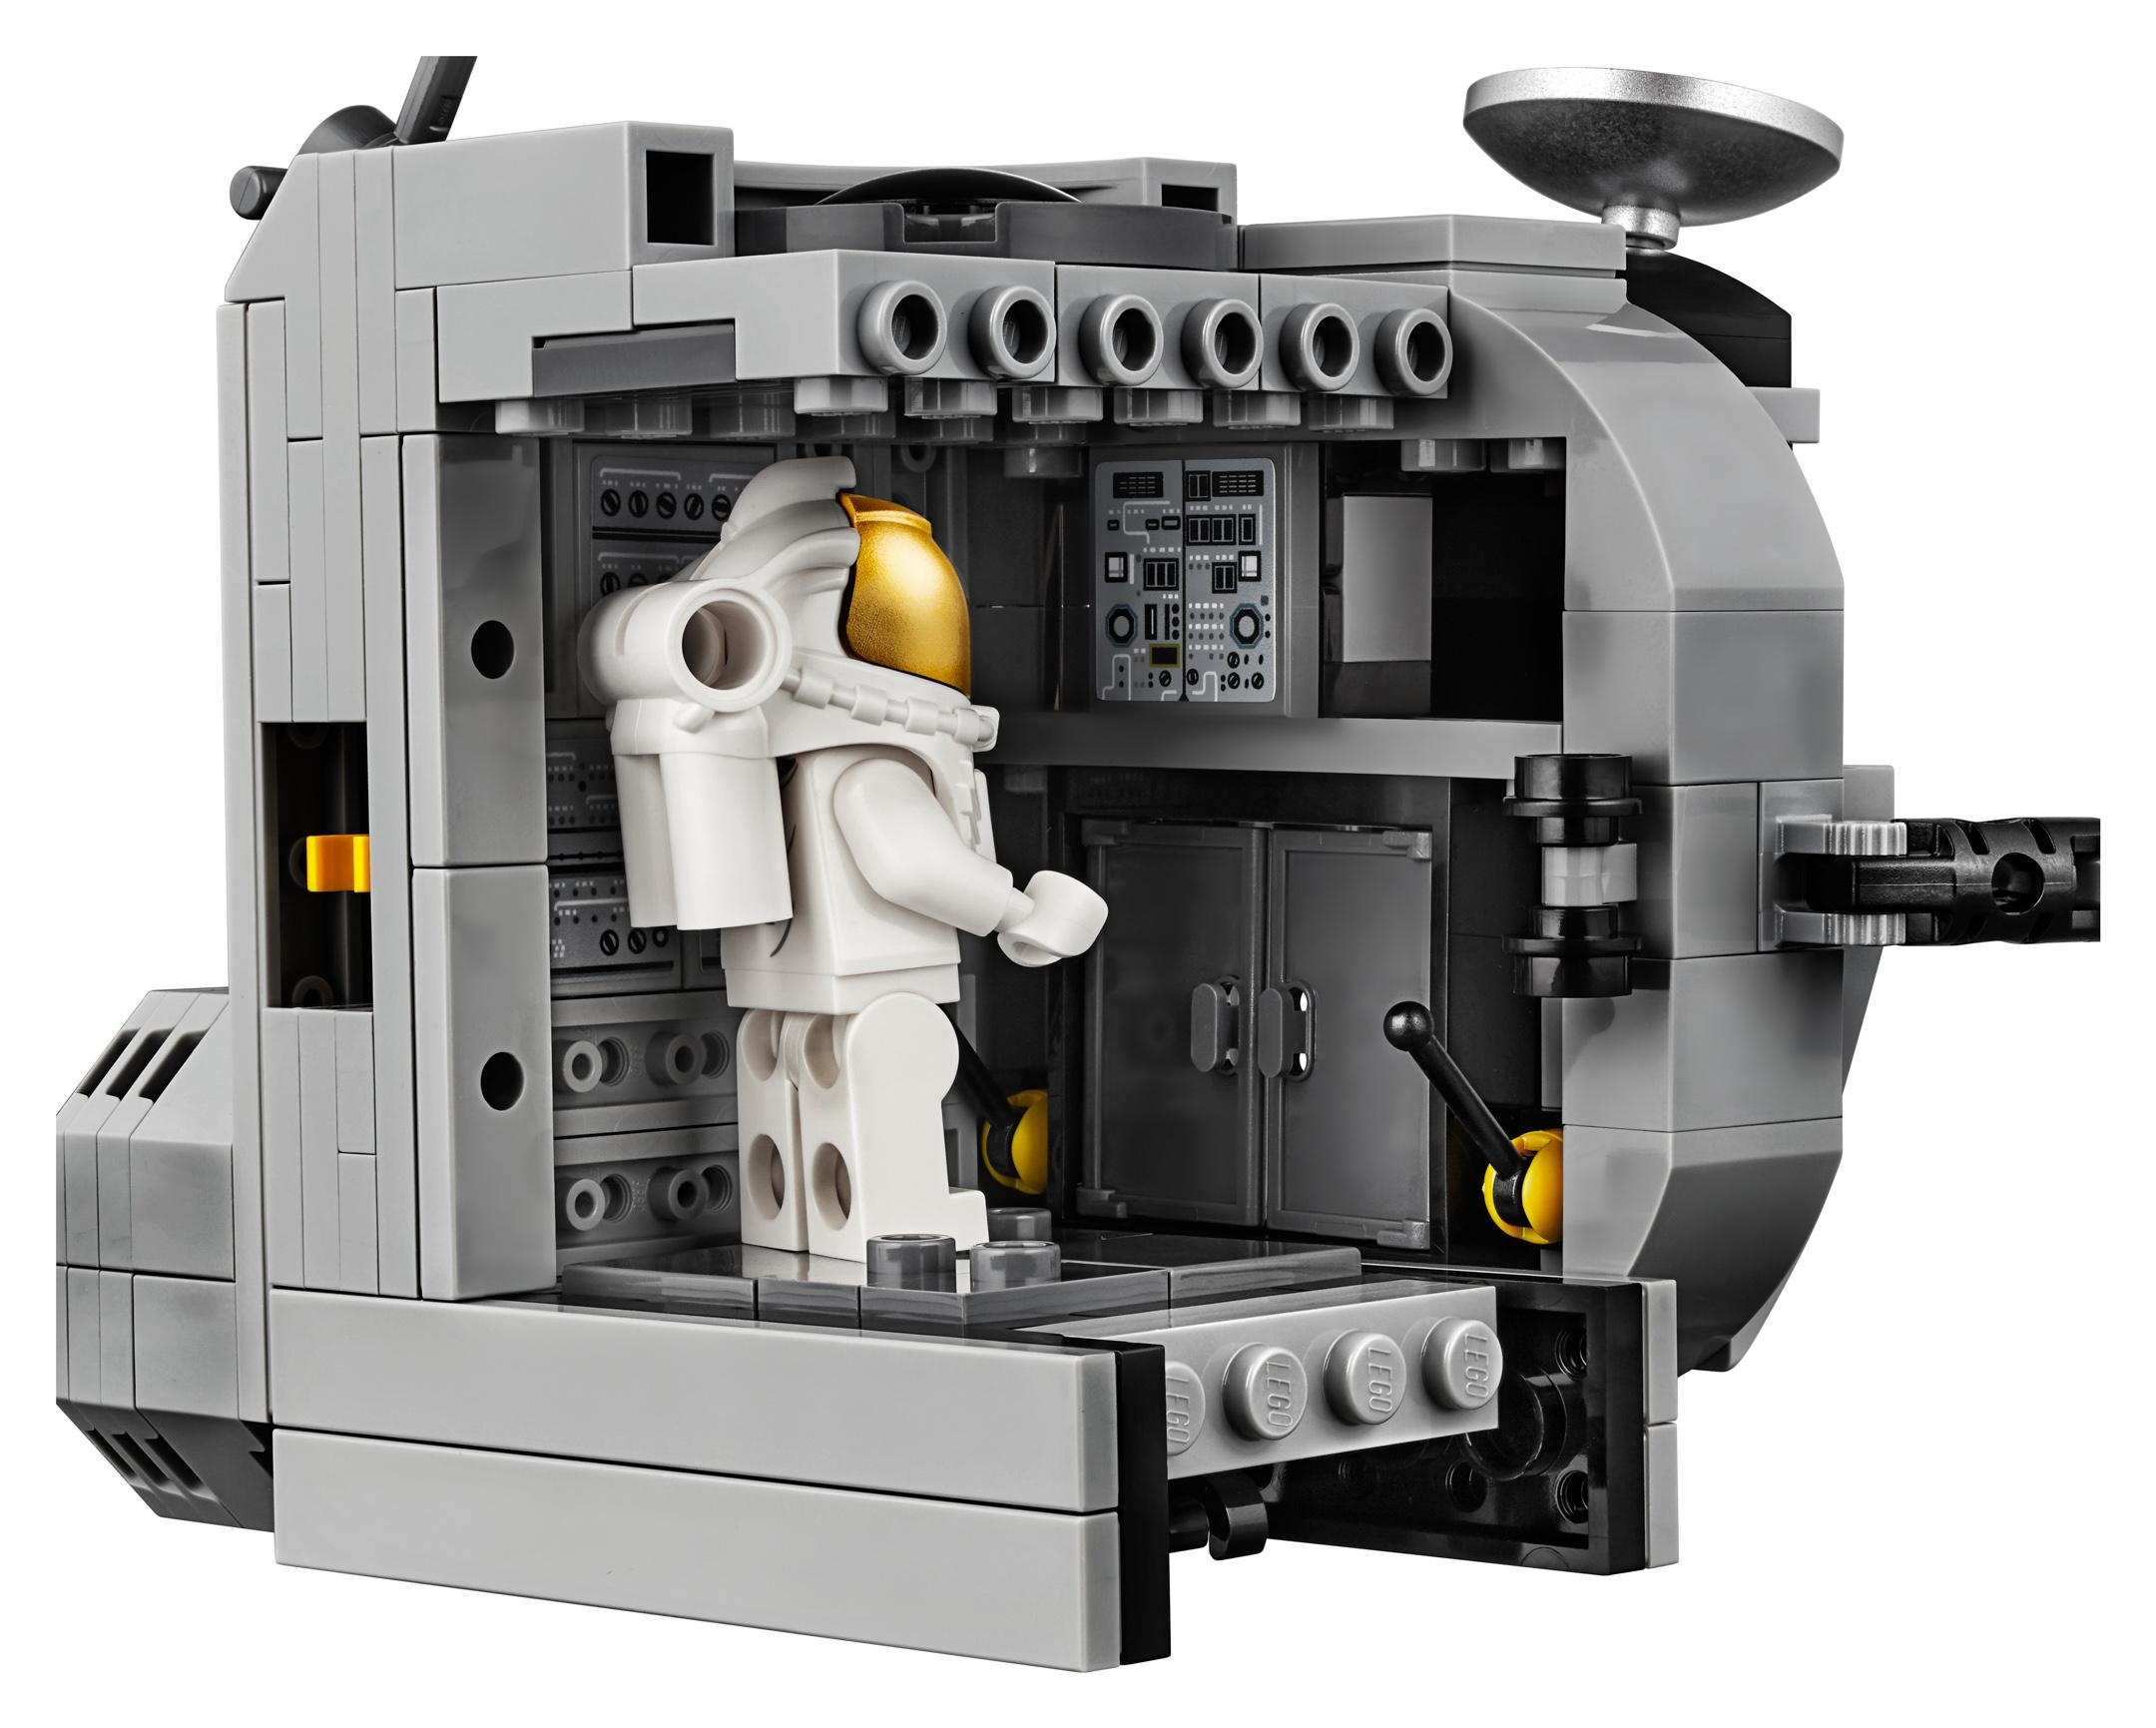 lego creator expert 10266 nasa apollo 11 lunar lander 16. Black Bedroom Furniture Sets. Home Design Ideas